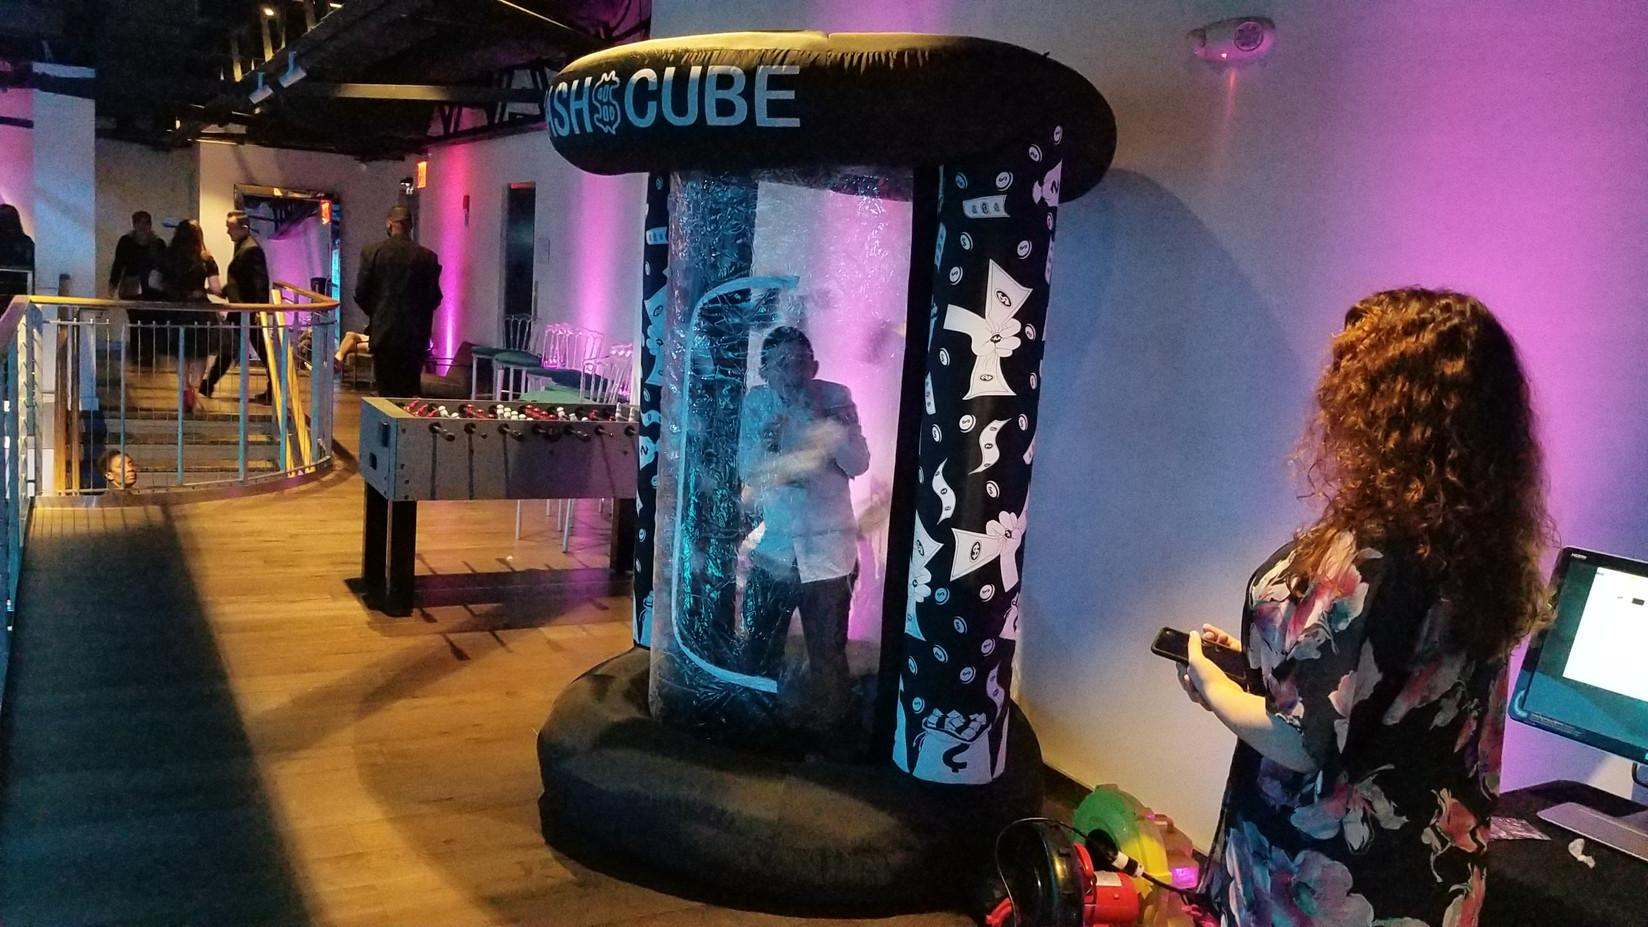 Cash-Cube-Game.jpg